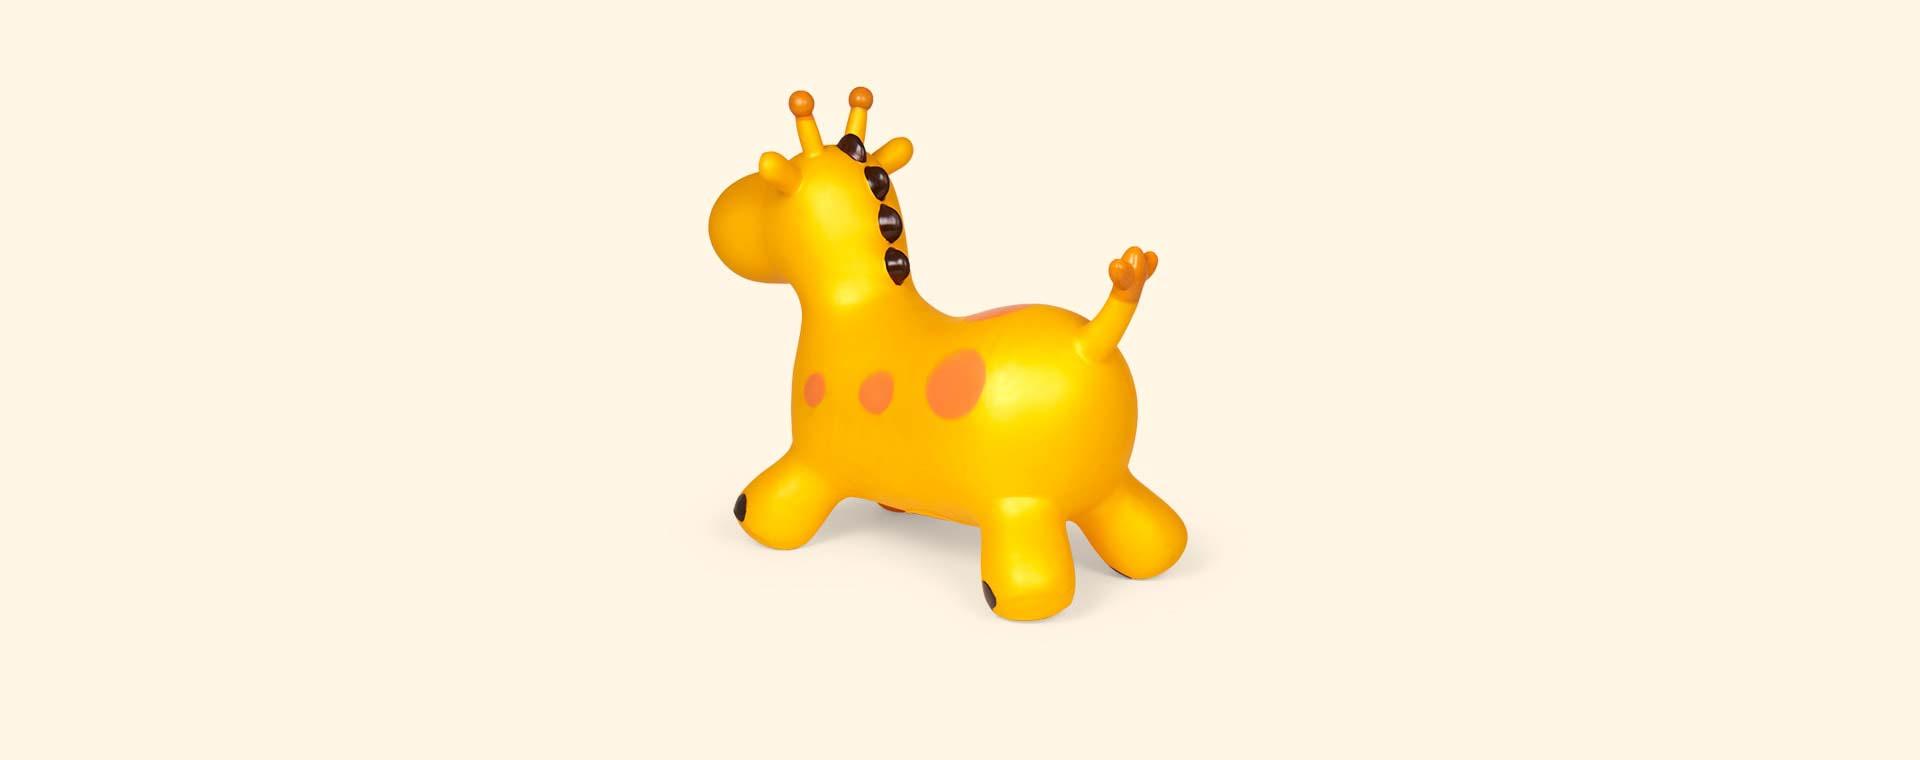 Yellow Giraffe Happy Hopperz Small Giraffe Hopper